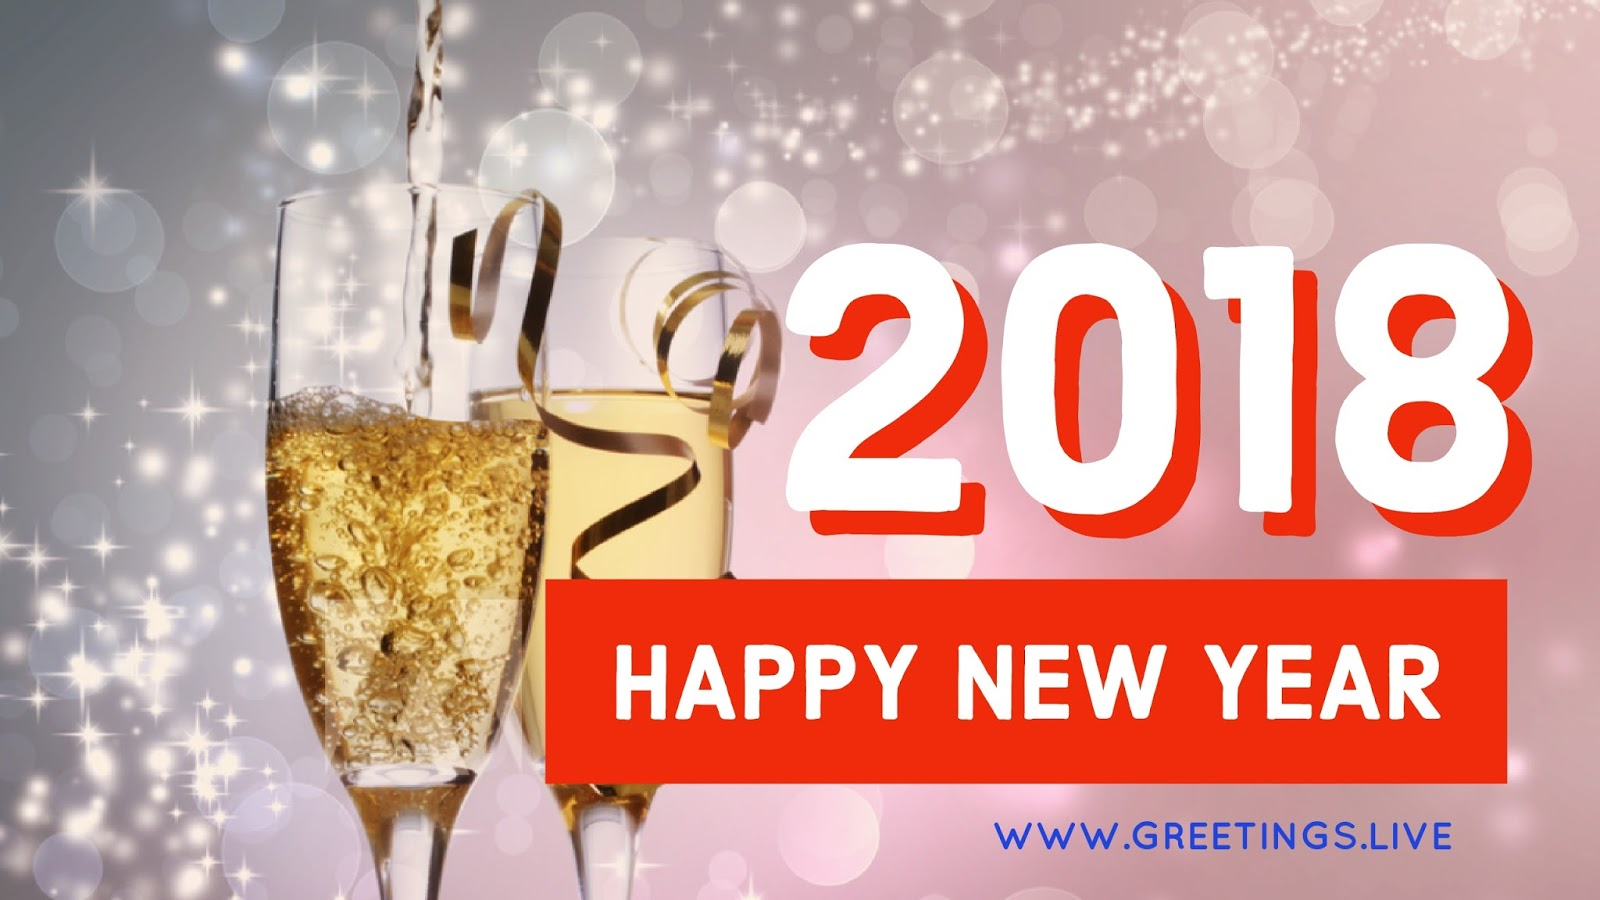 creative new year 2018 celebration wishes ideas